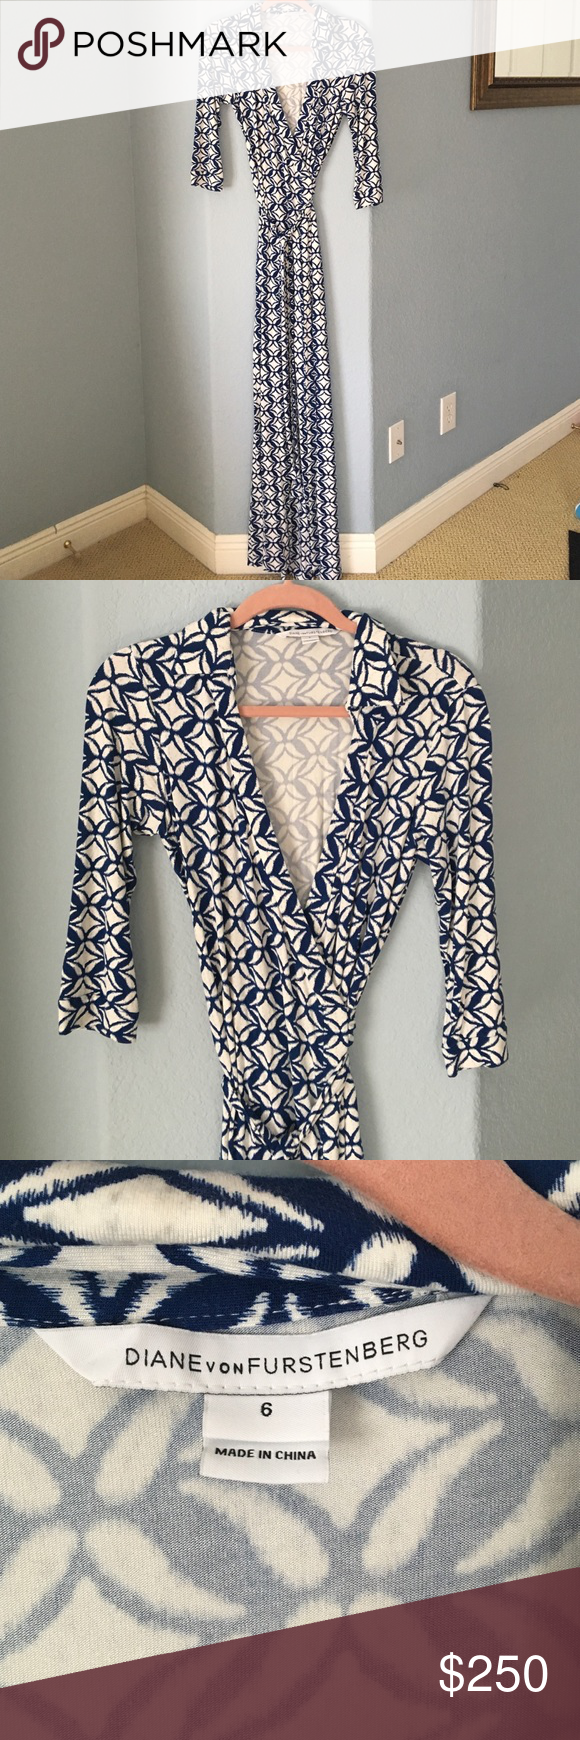 Classic Diane Von Furstenberg Maxi Wrap Dress sz 6 Beautiful patterned maxi wrap dress sz 6. Fits like a dream like all DVF dresses. Very lightly worn. Diane von Furstenberg Dresses Maxi